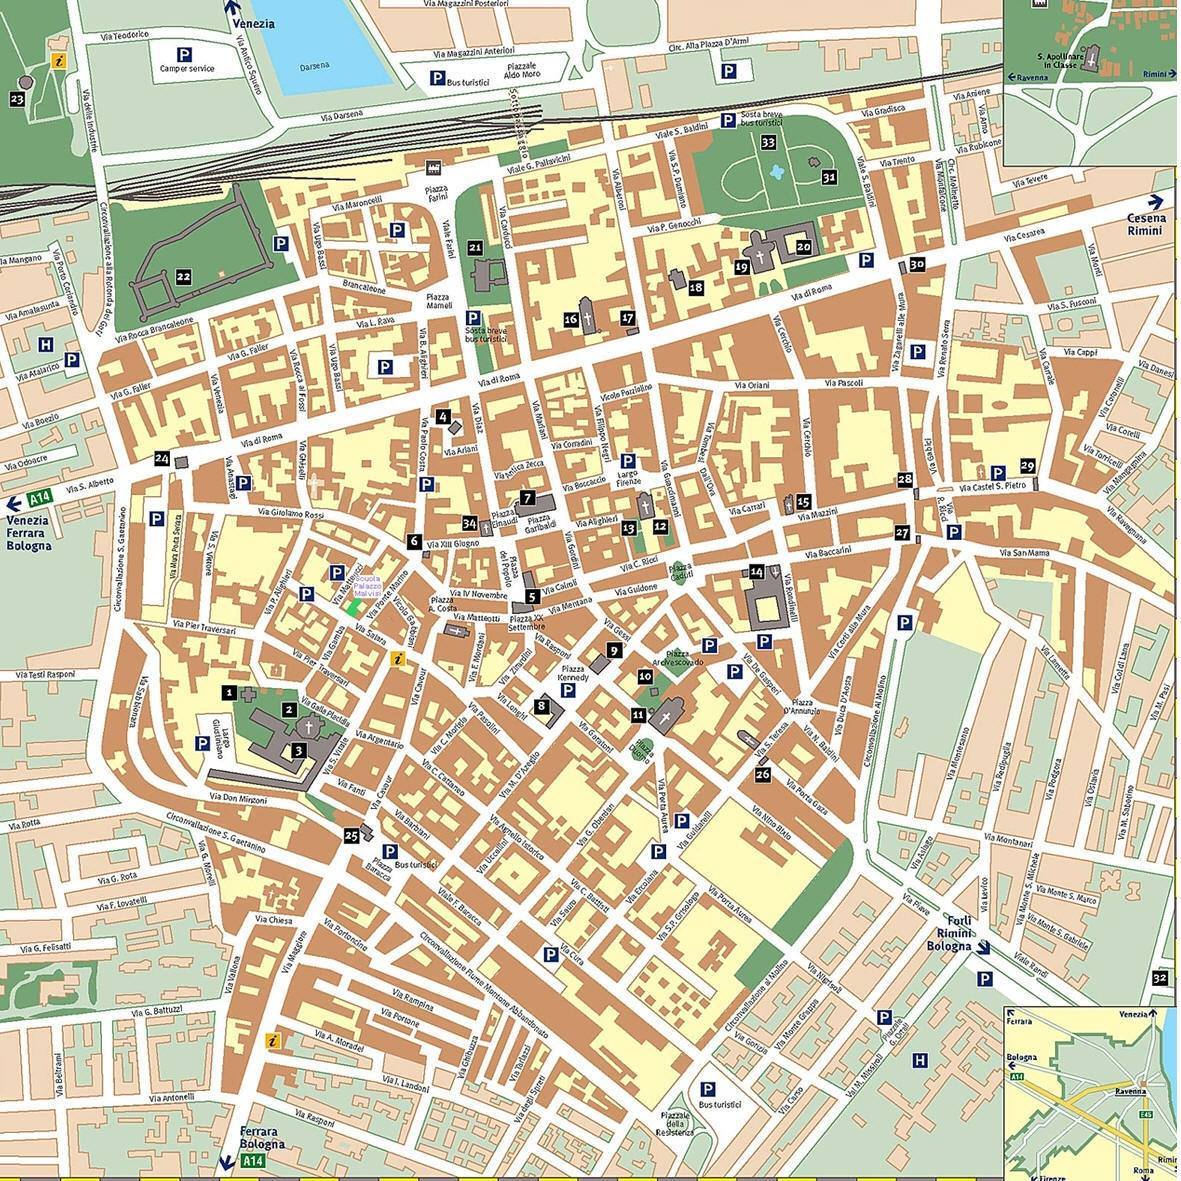 Ravenna Cartina Geografica Italia.Mappa Di Ravenna Cartina Di Ravenna